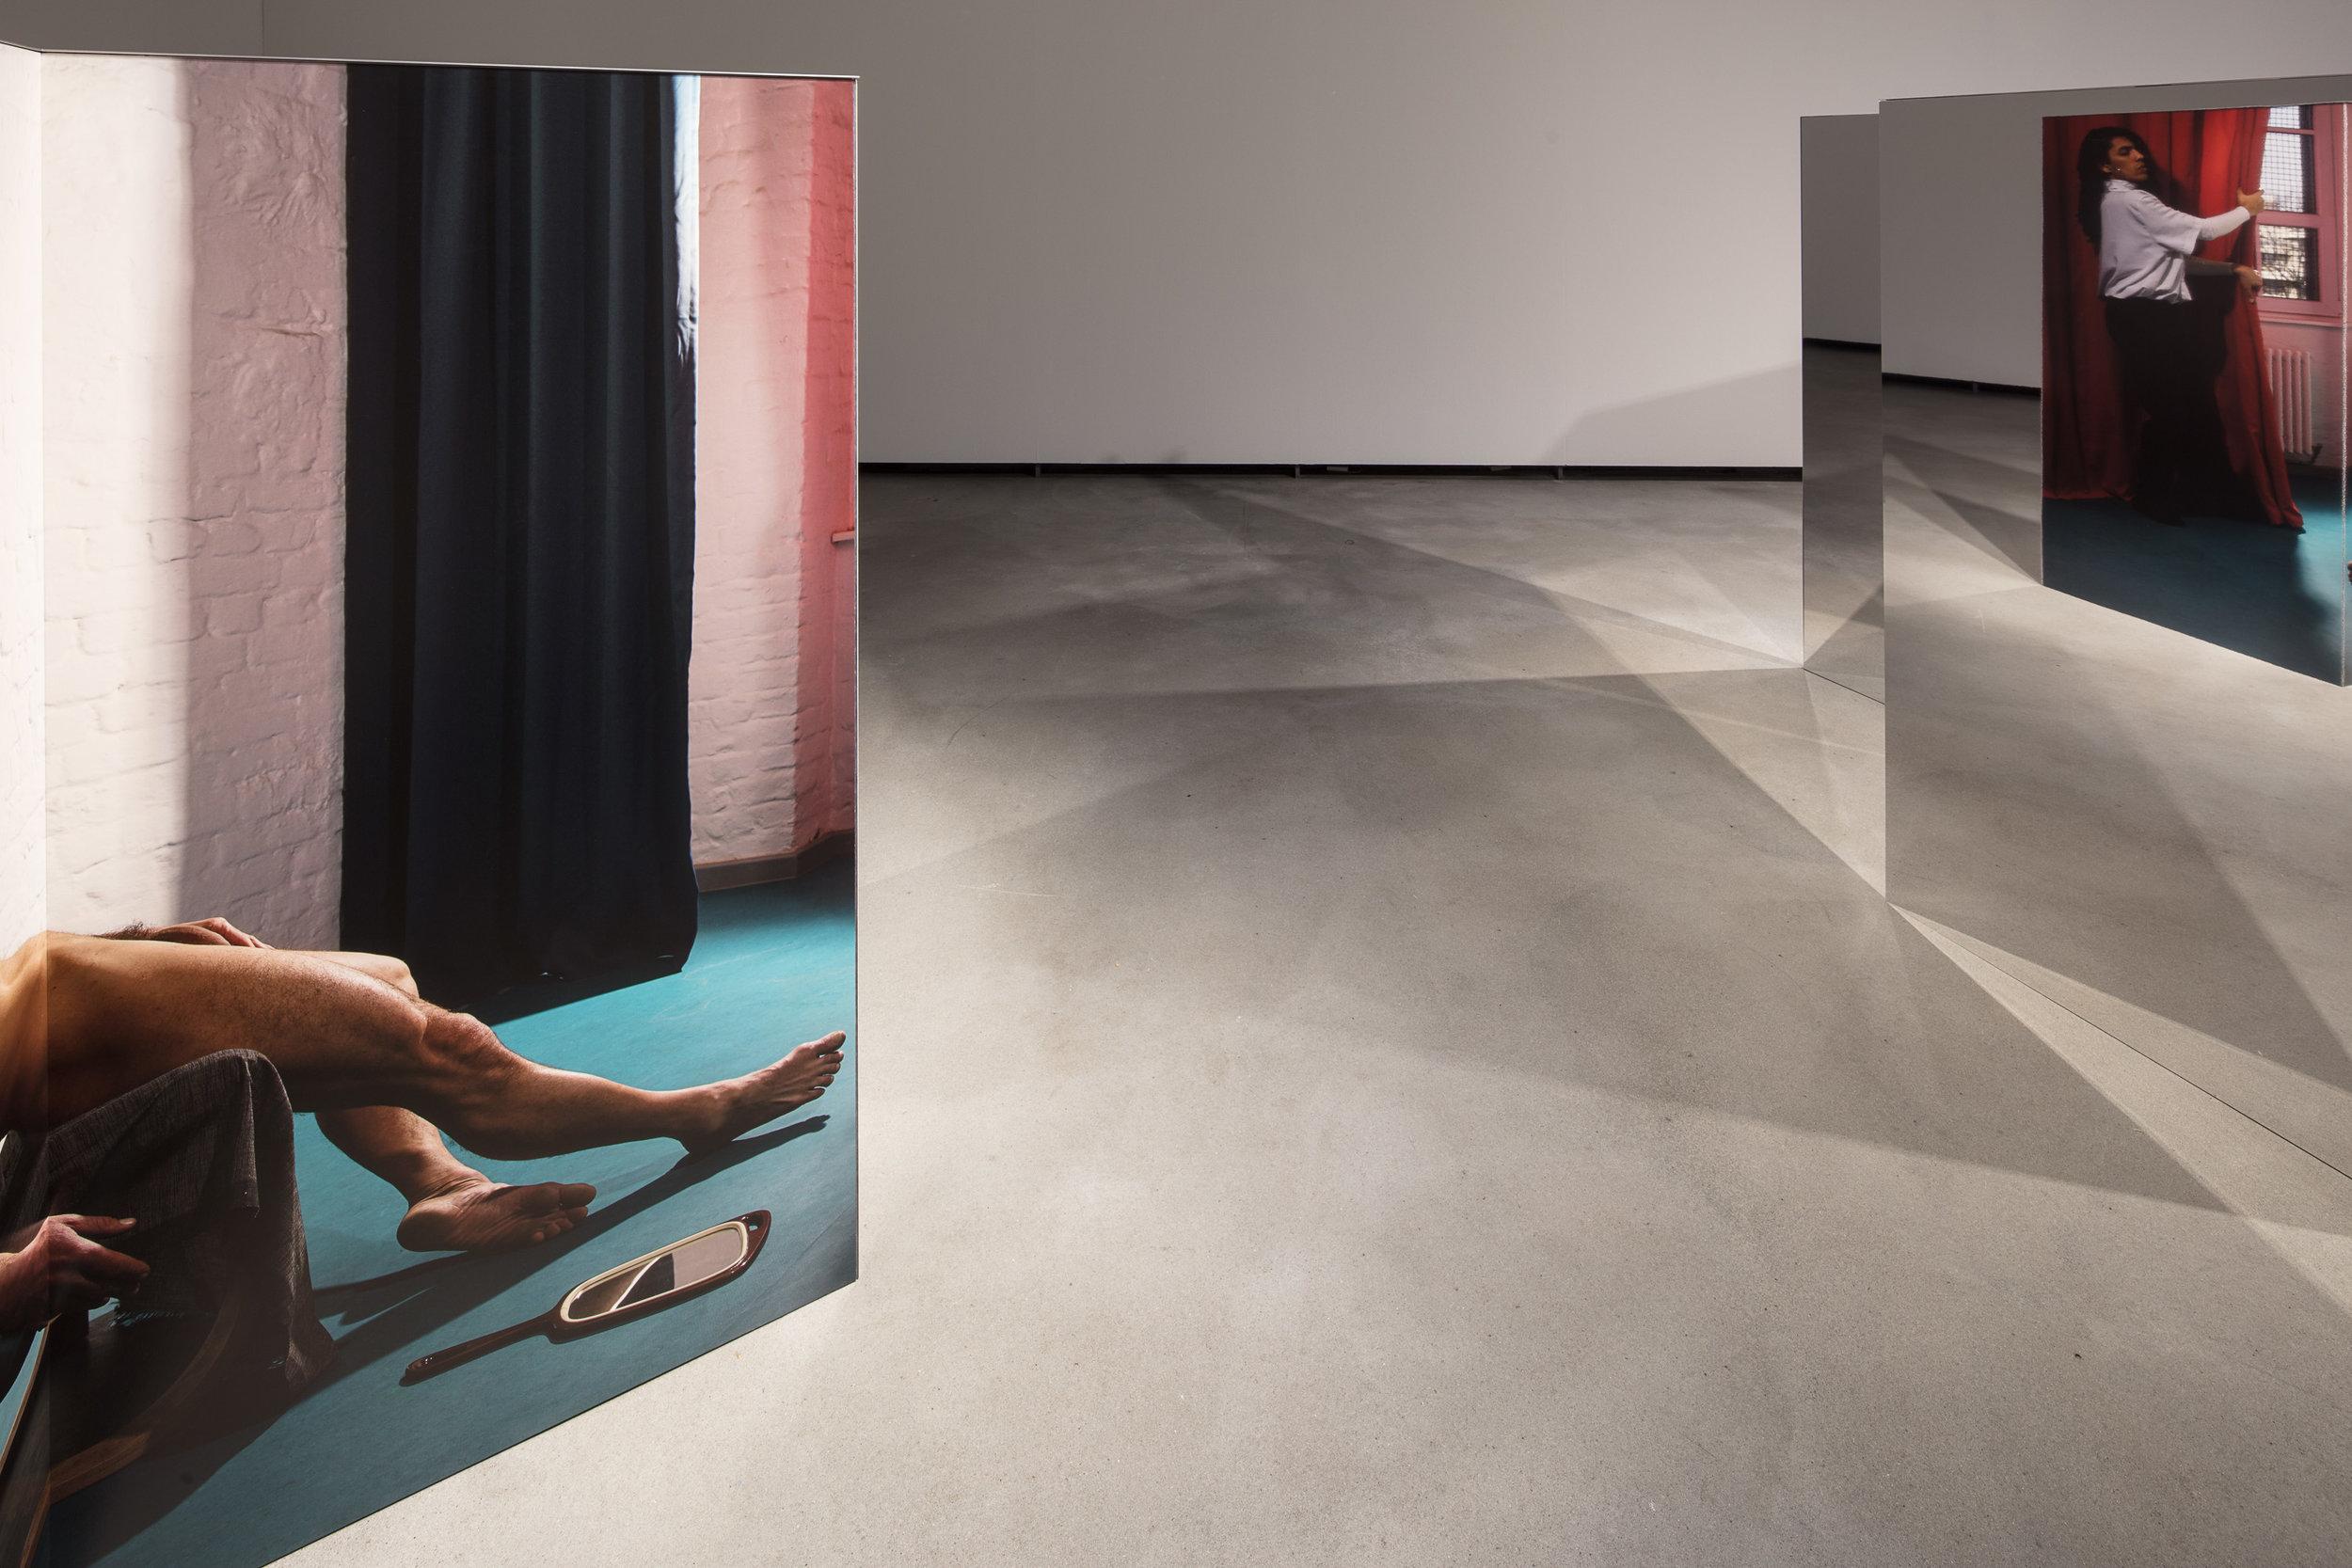 4.Changing Room, Installation view Künsterlhaus Bethanien, archival pigment print on AluDibond, mirror, aluminium, 2017